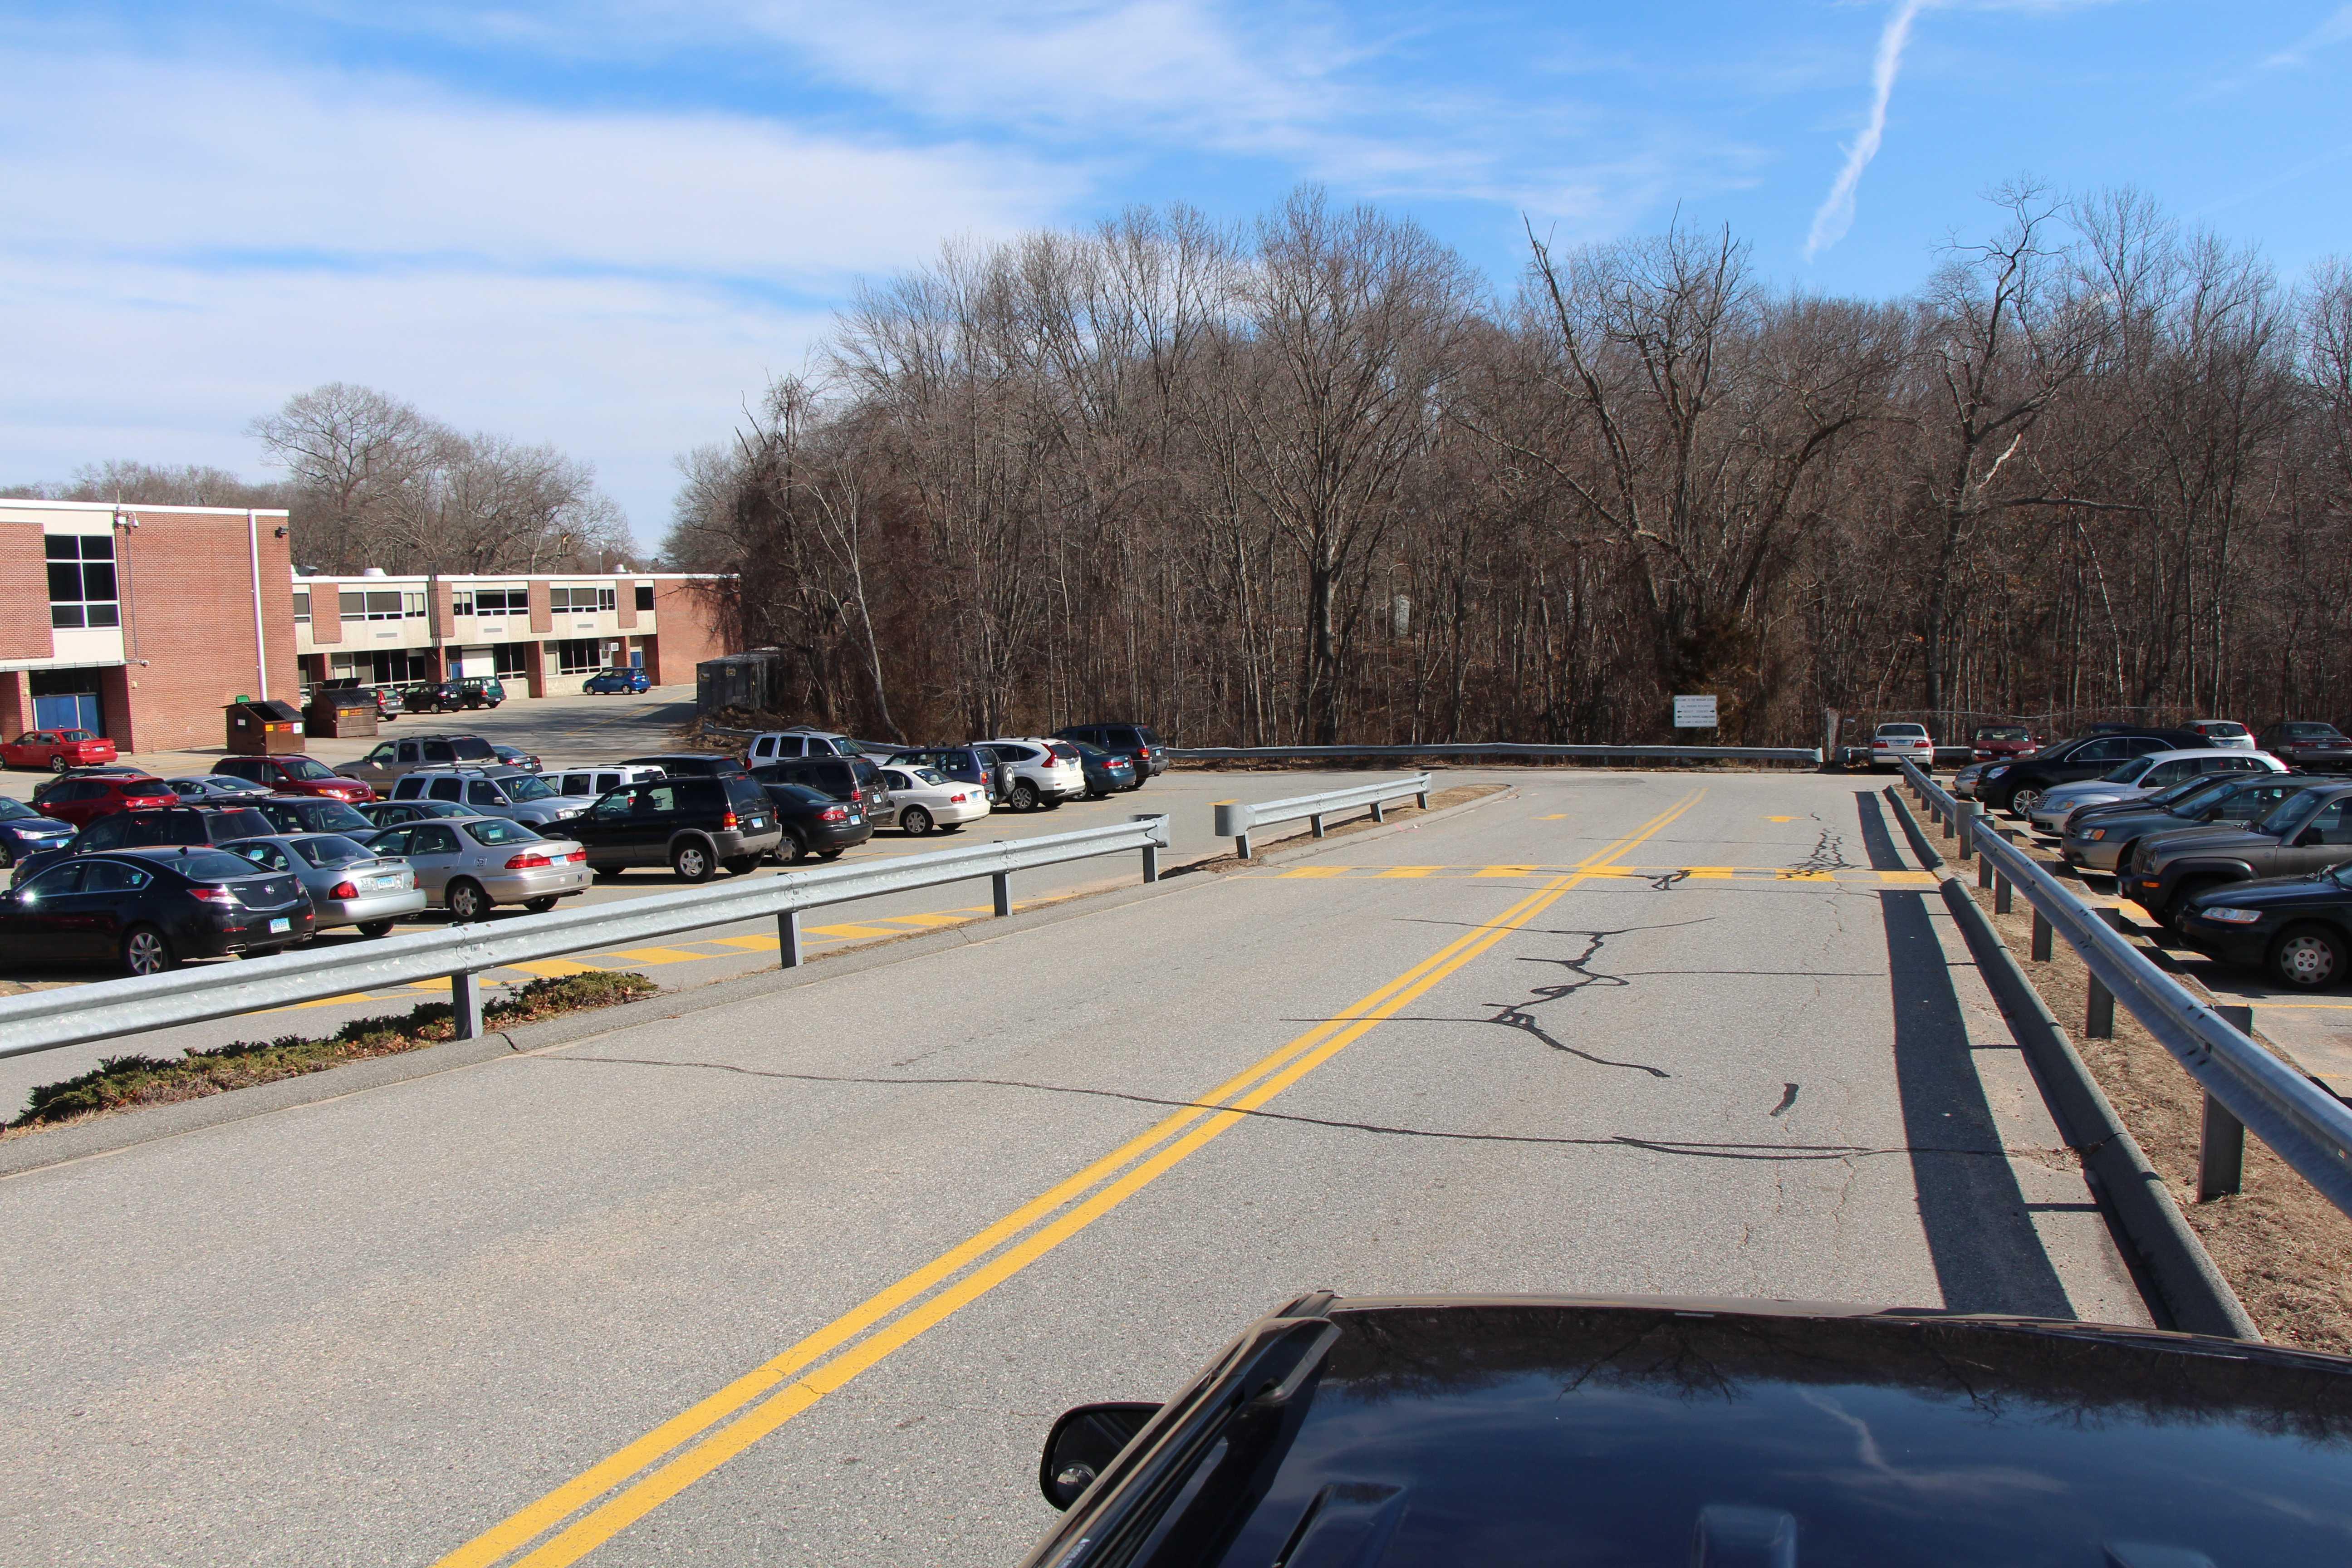 entrance ramp current school